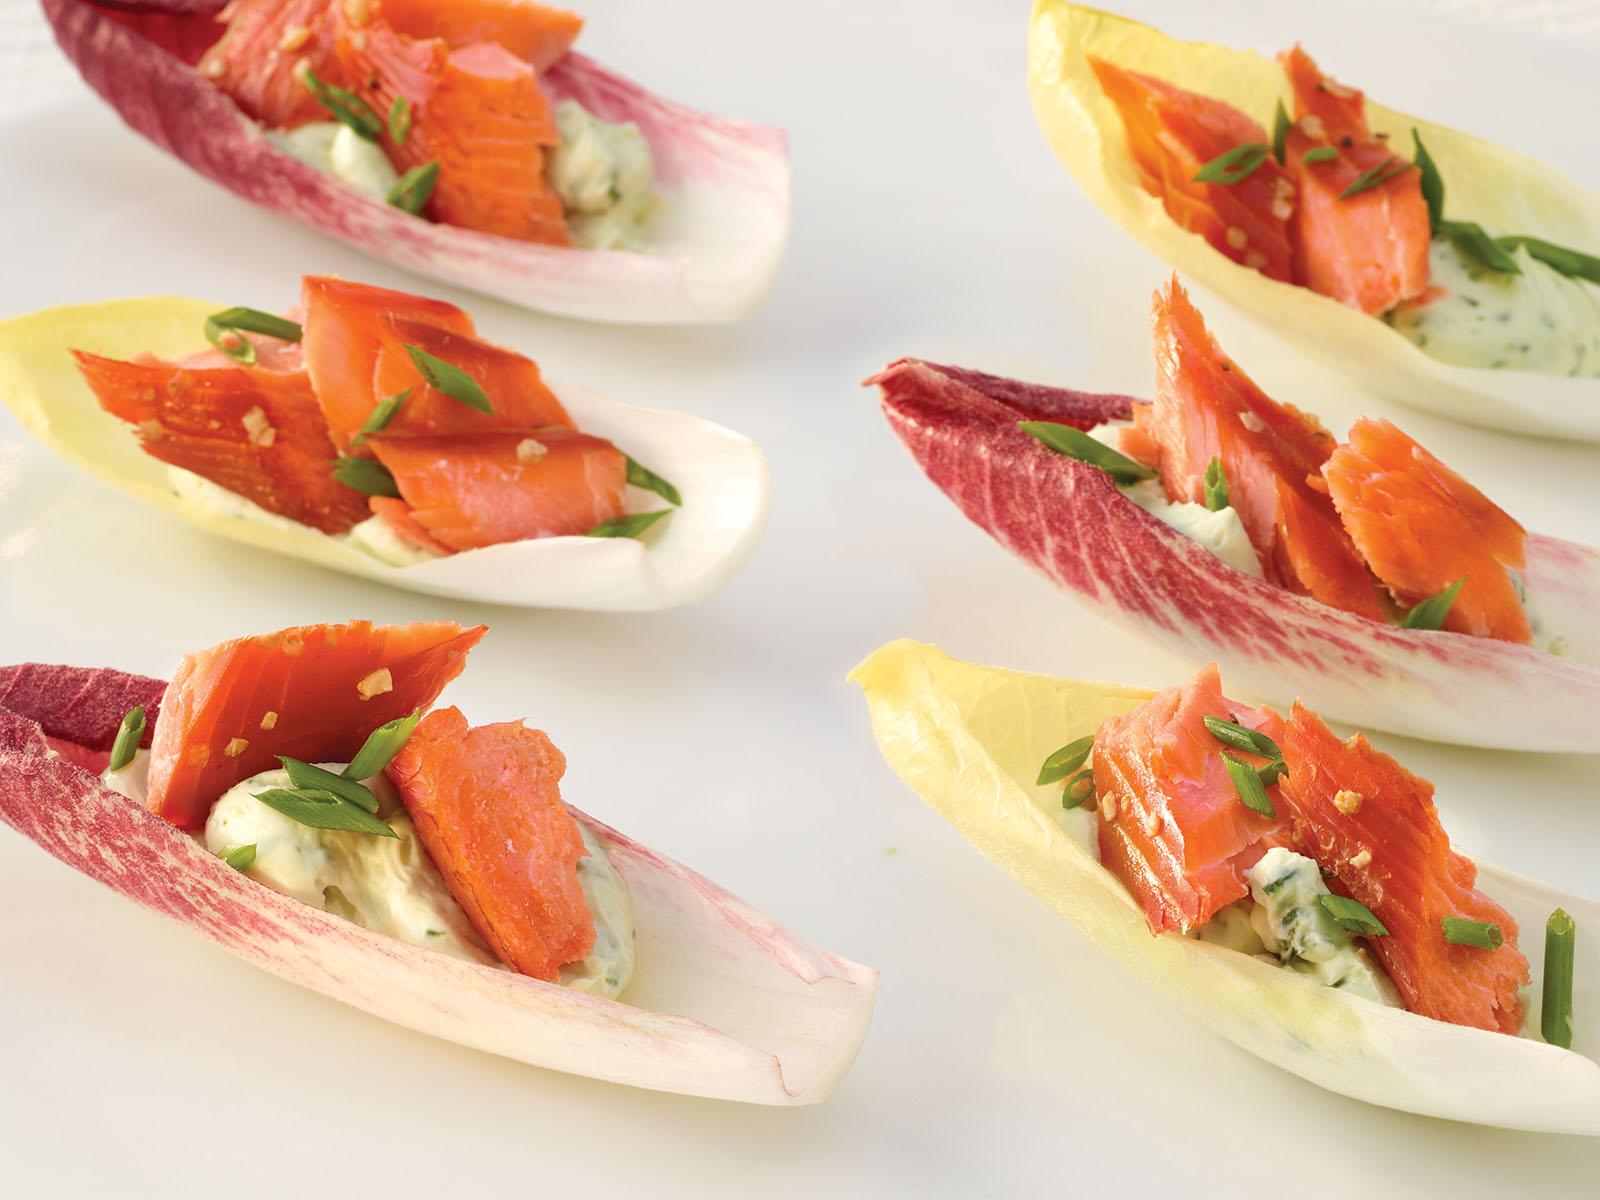 Trident Seafoods® Smoked Sockeye Salmon - Sweet & Savory 4 oz